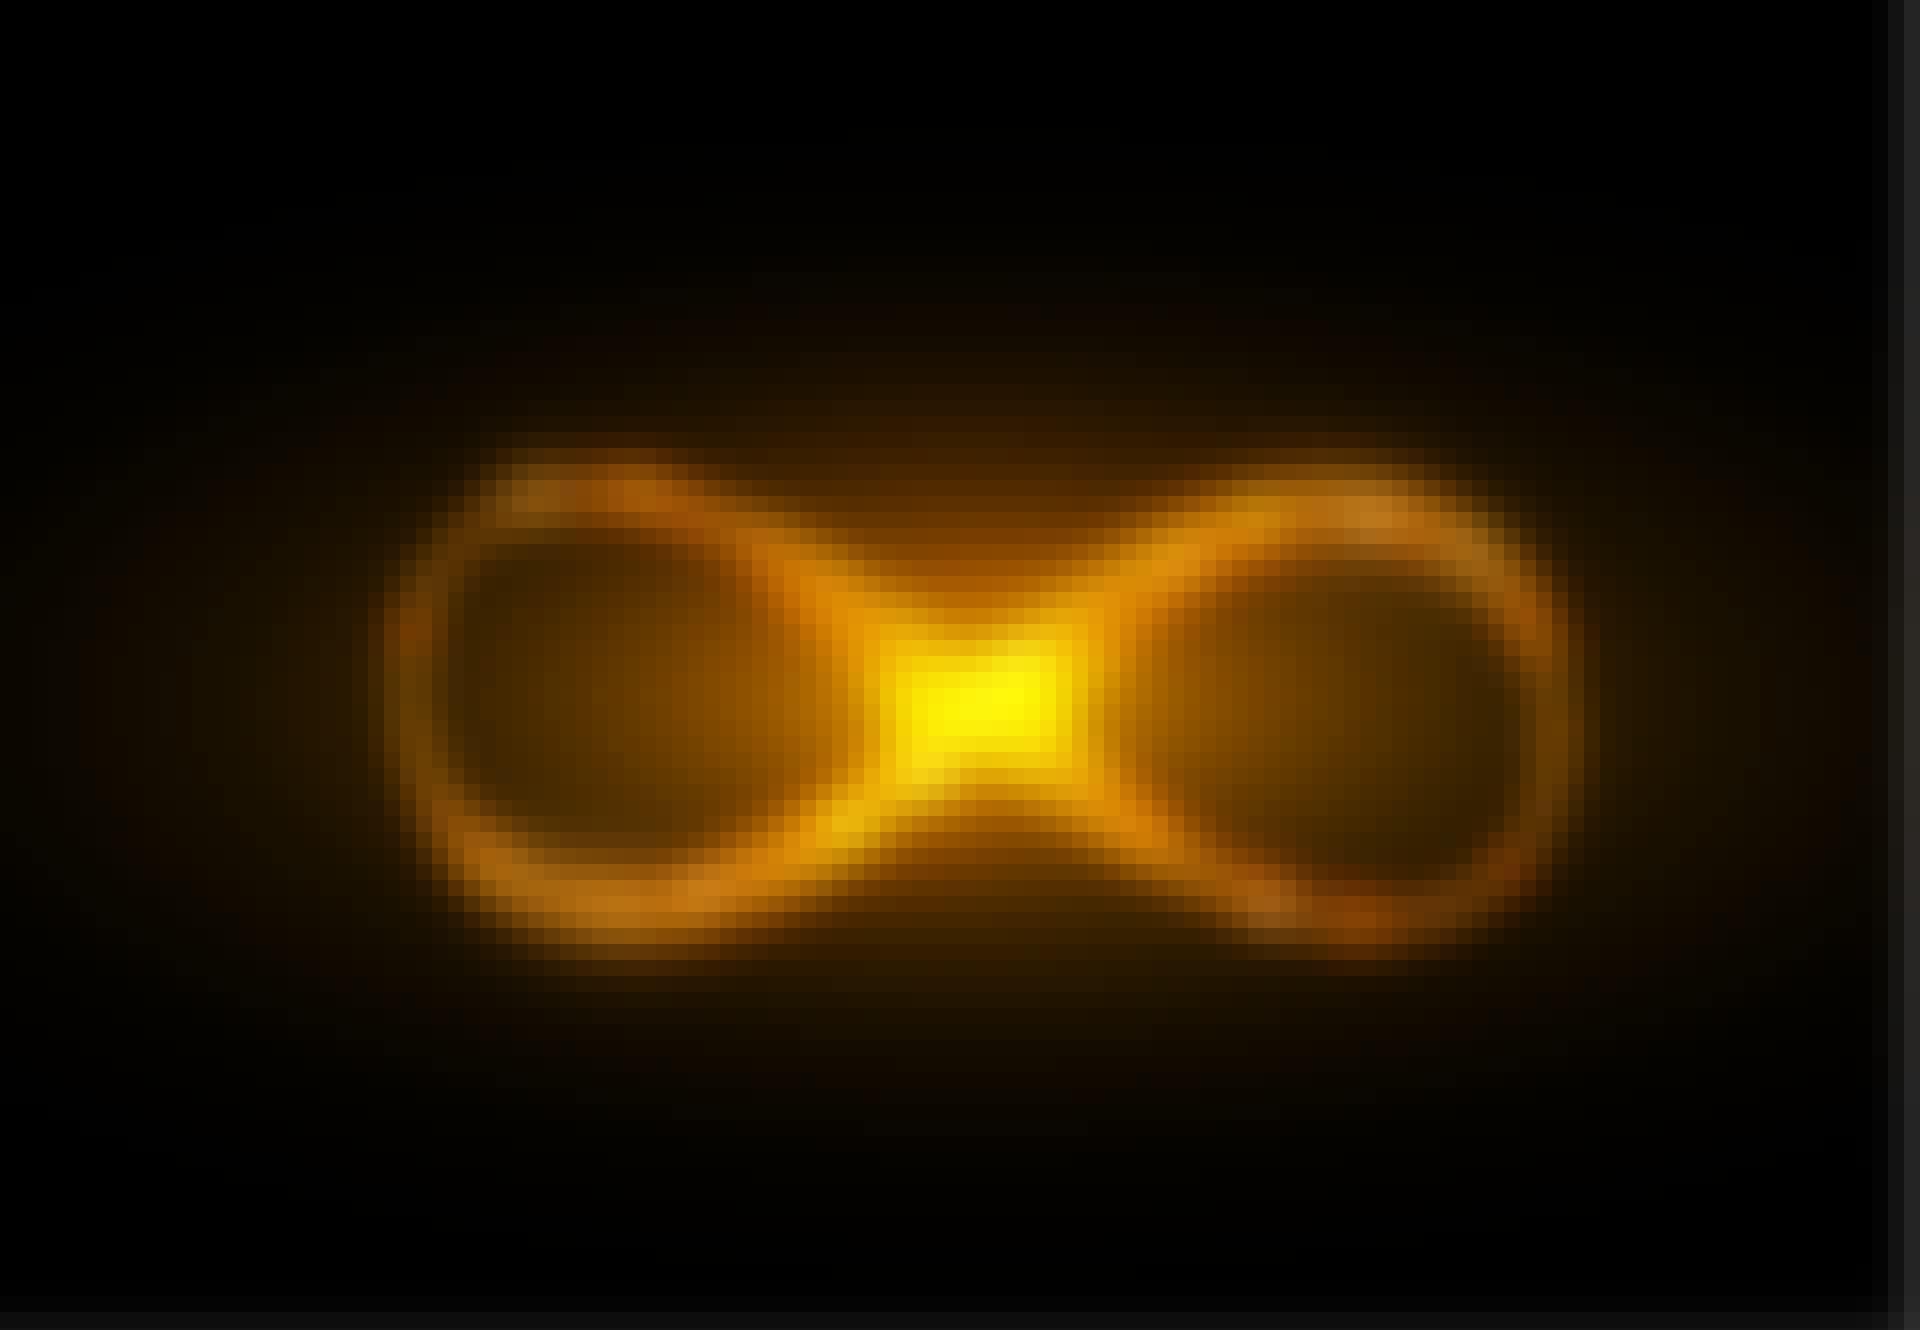 Gul evighetssymbol mot svart bakgrund